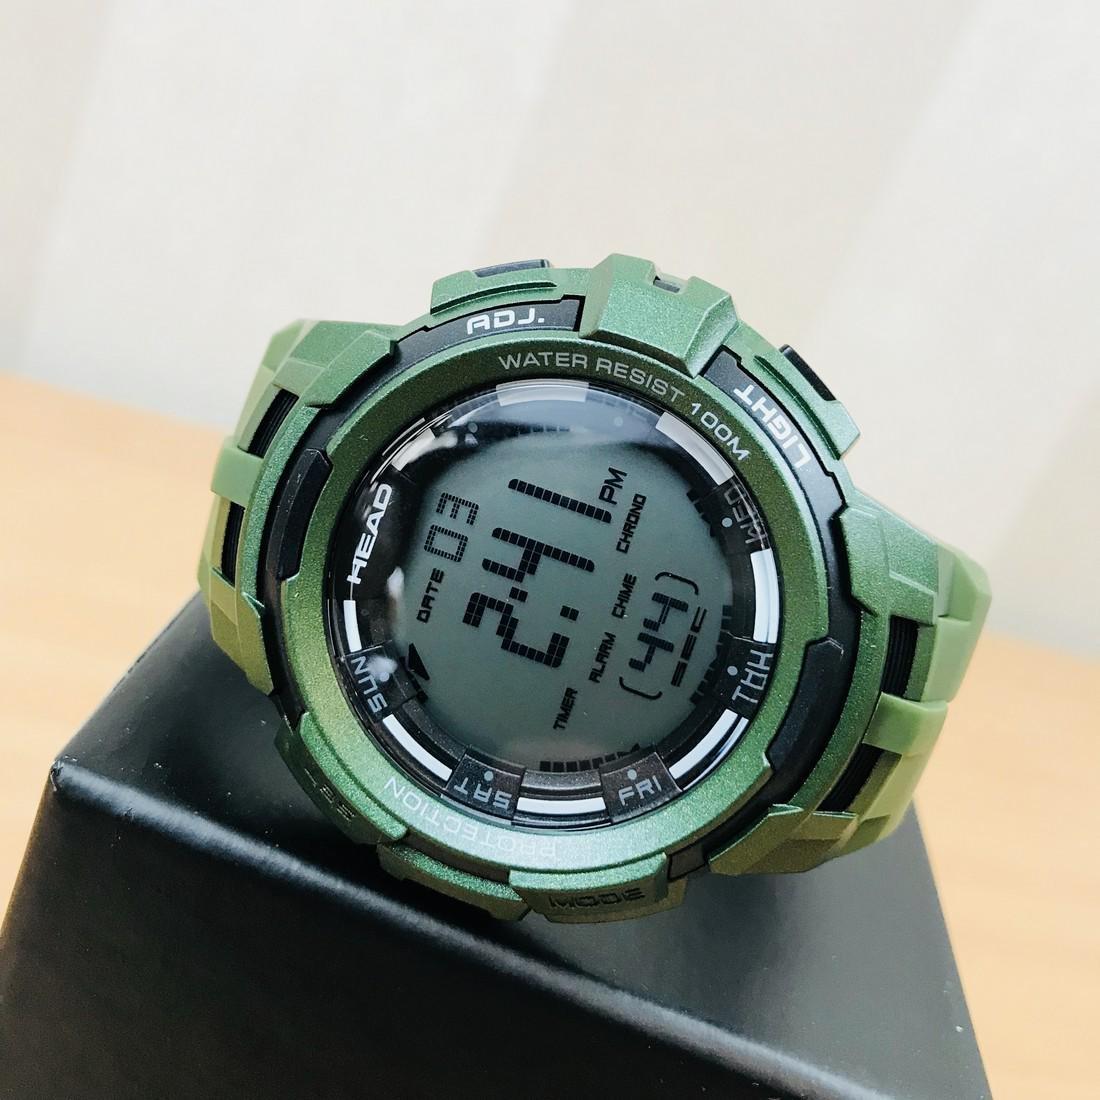 HEAD Super G Green Multifunctional Watch